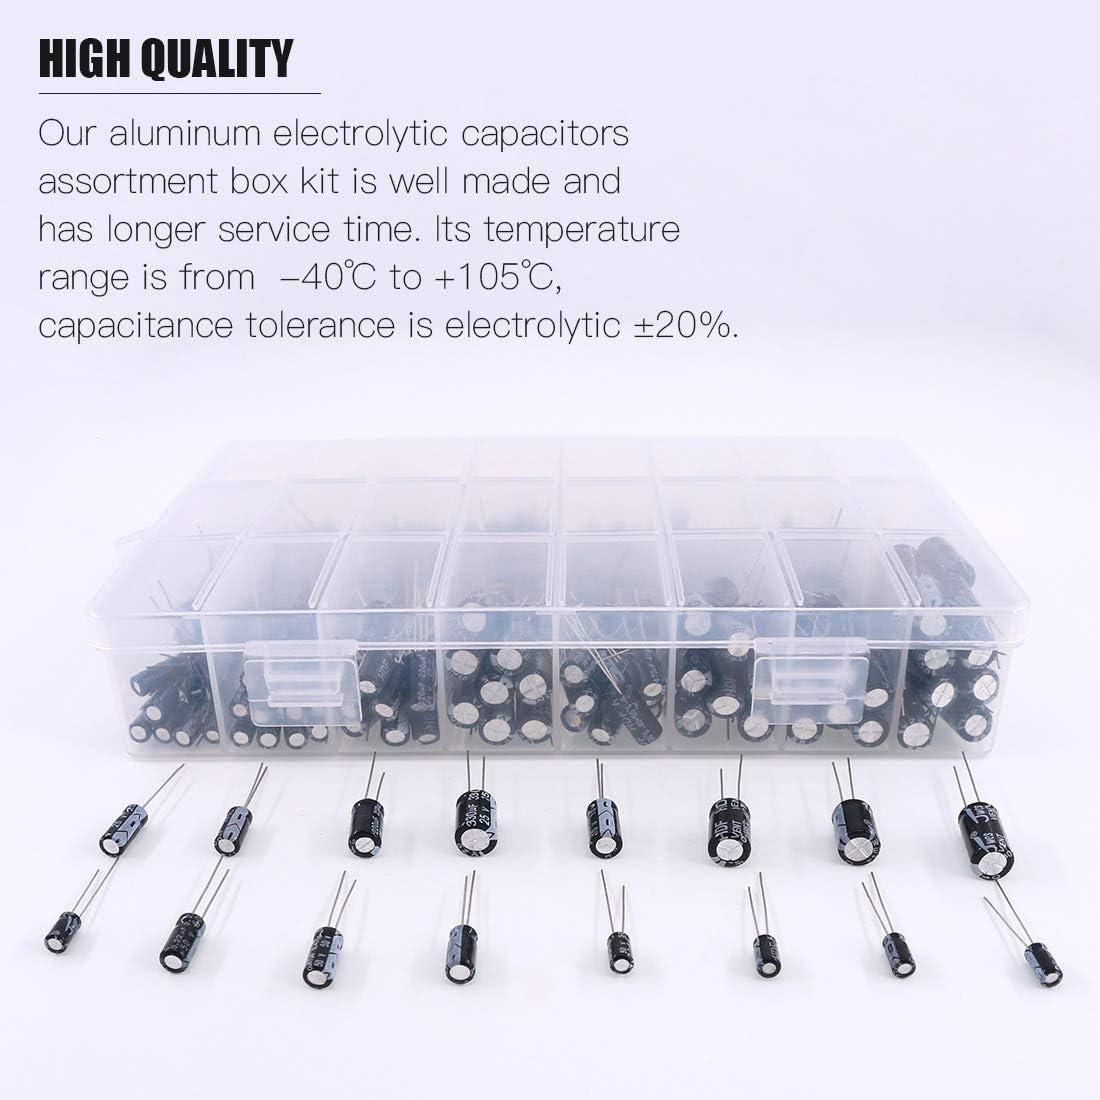 Rustark 405Pcs 24 Value 10V 16V 25V 50V Aluminum Electrolytic Capacitor Assortment Box Kit Range 0.1uF-1000uF